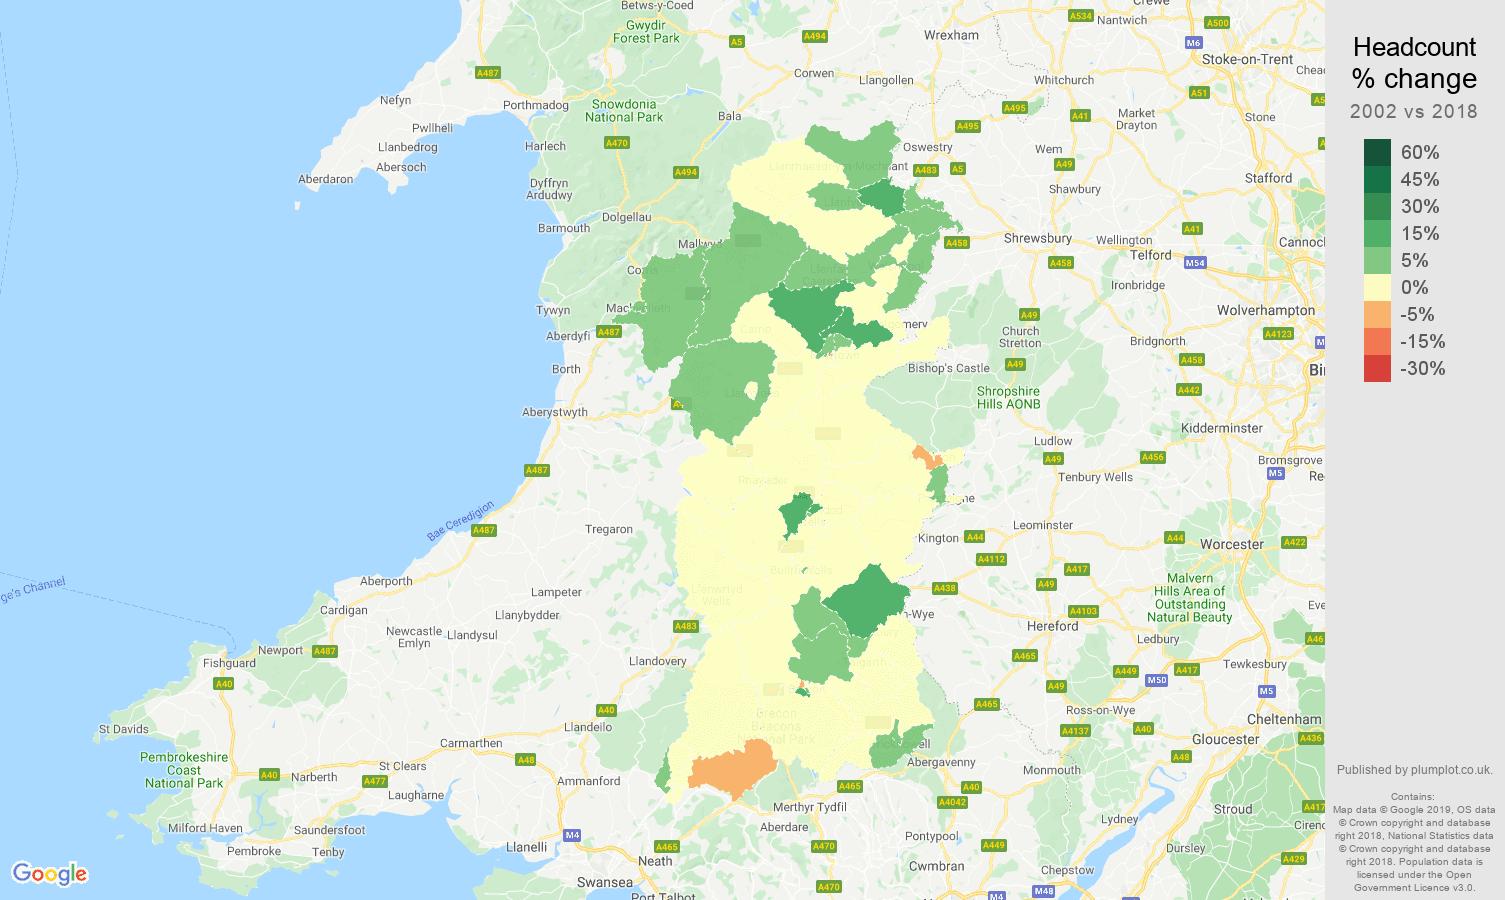 Powys headcount change map